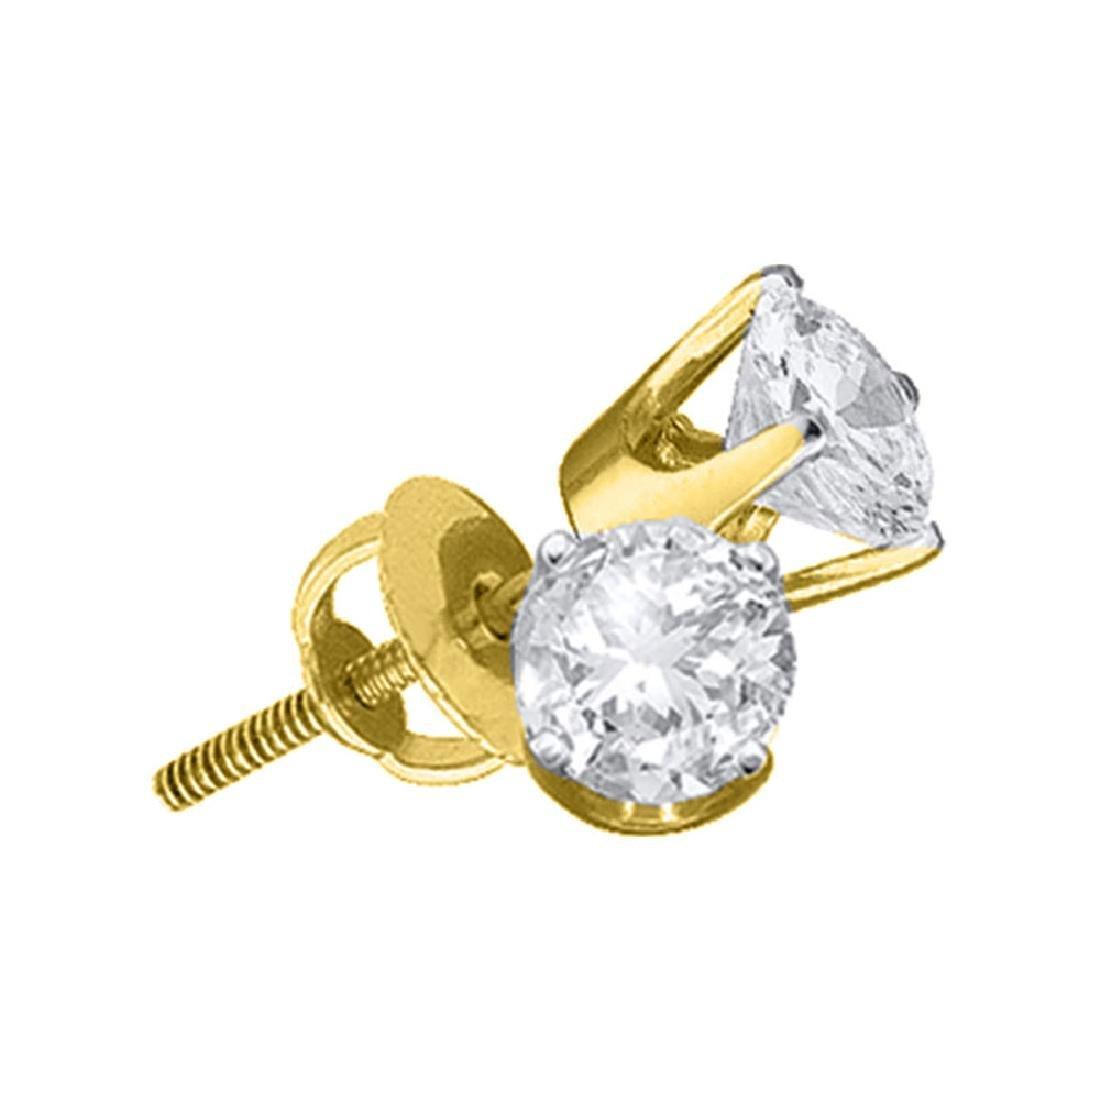 0.10 CTW Diamond Solitaire Stud Earrings 14KT Yellow